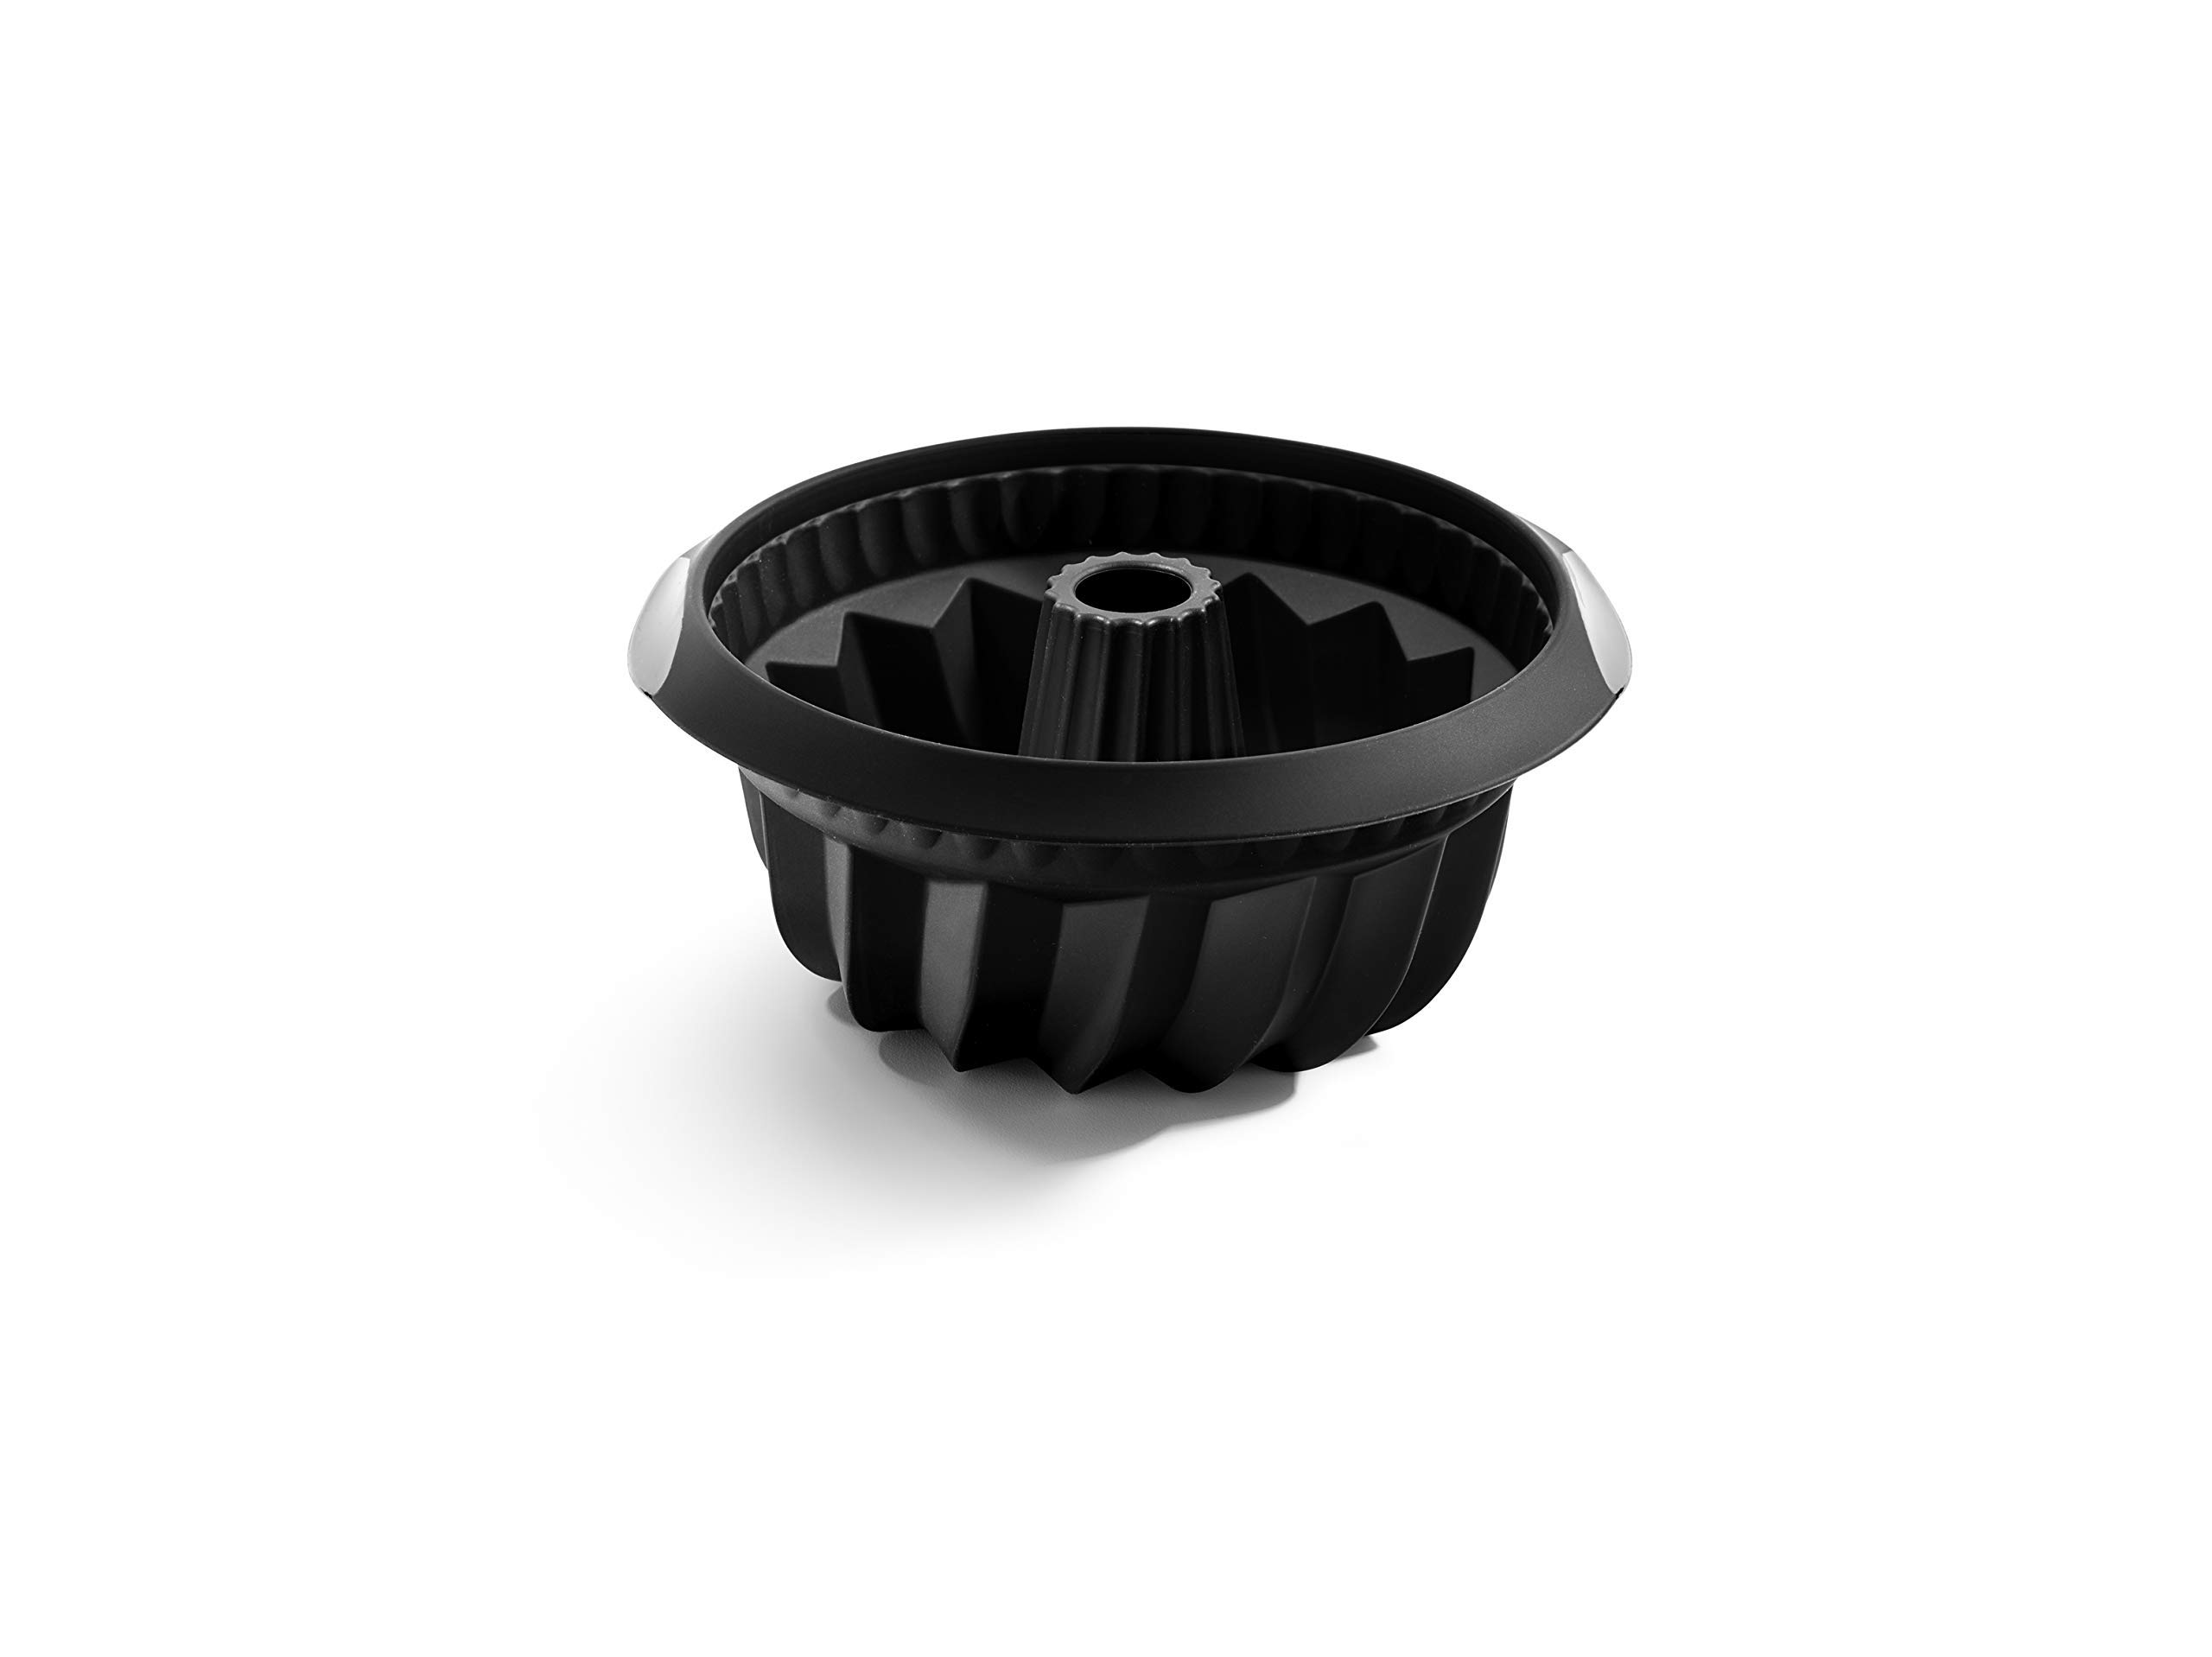 Lékué Classic - Molde Hondo para savarín, 22 cm, Color Negro product image